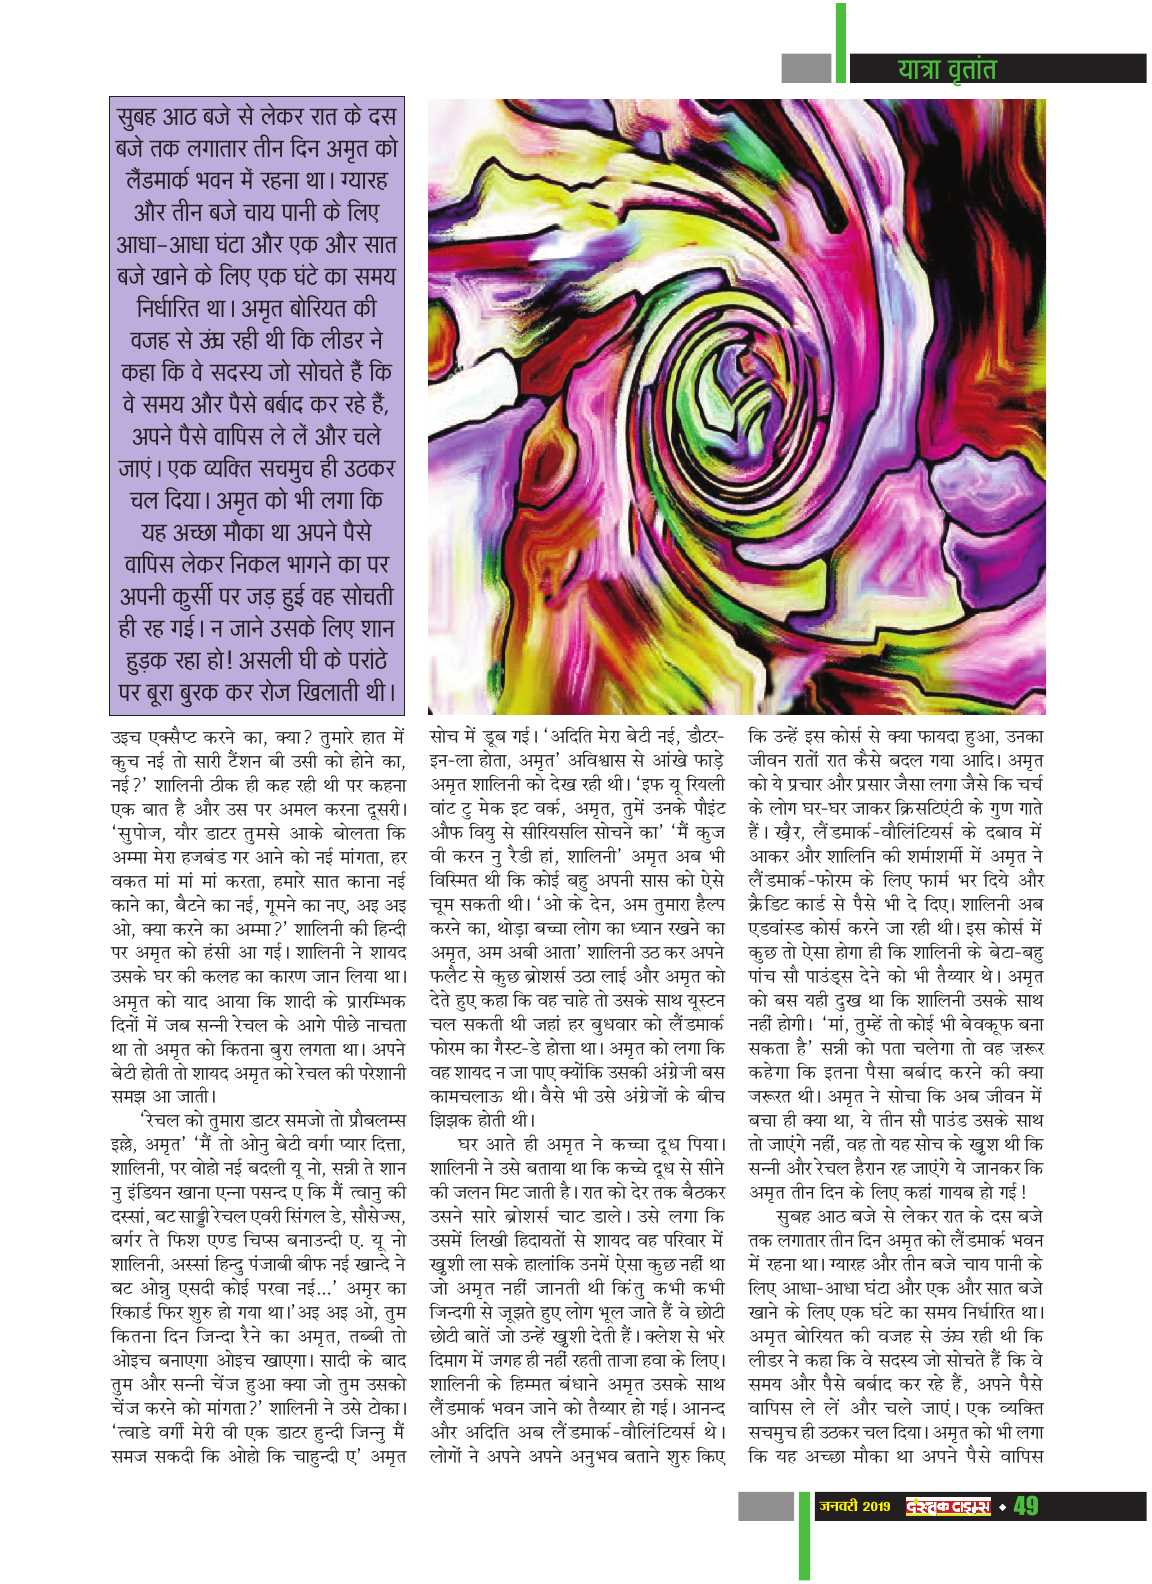 Dastak Times for E-Magazine 15 Jan 2019 new51